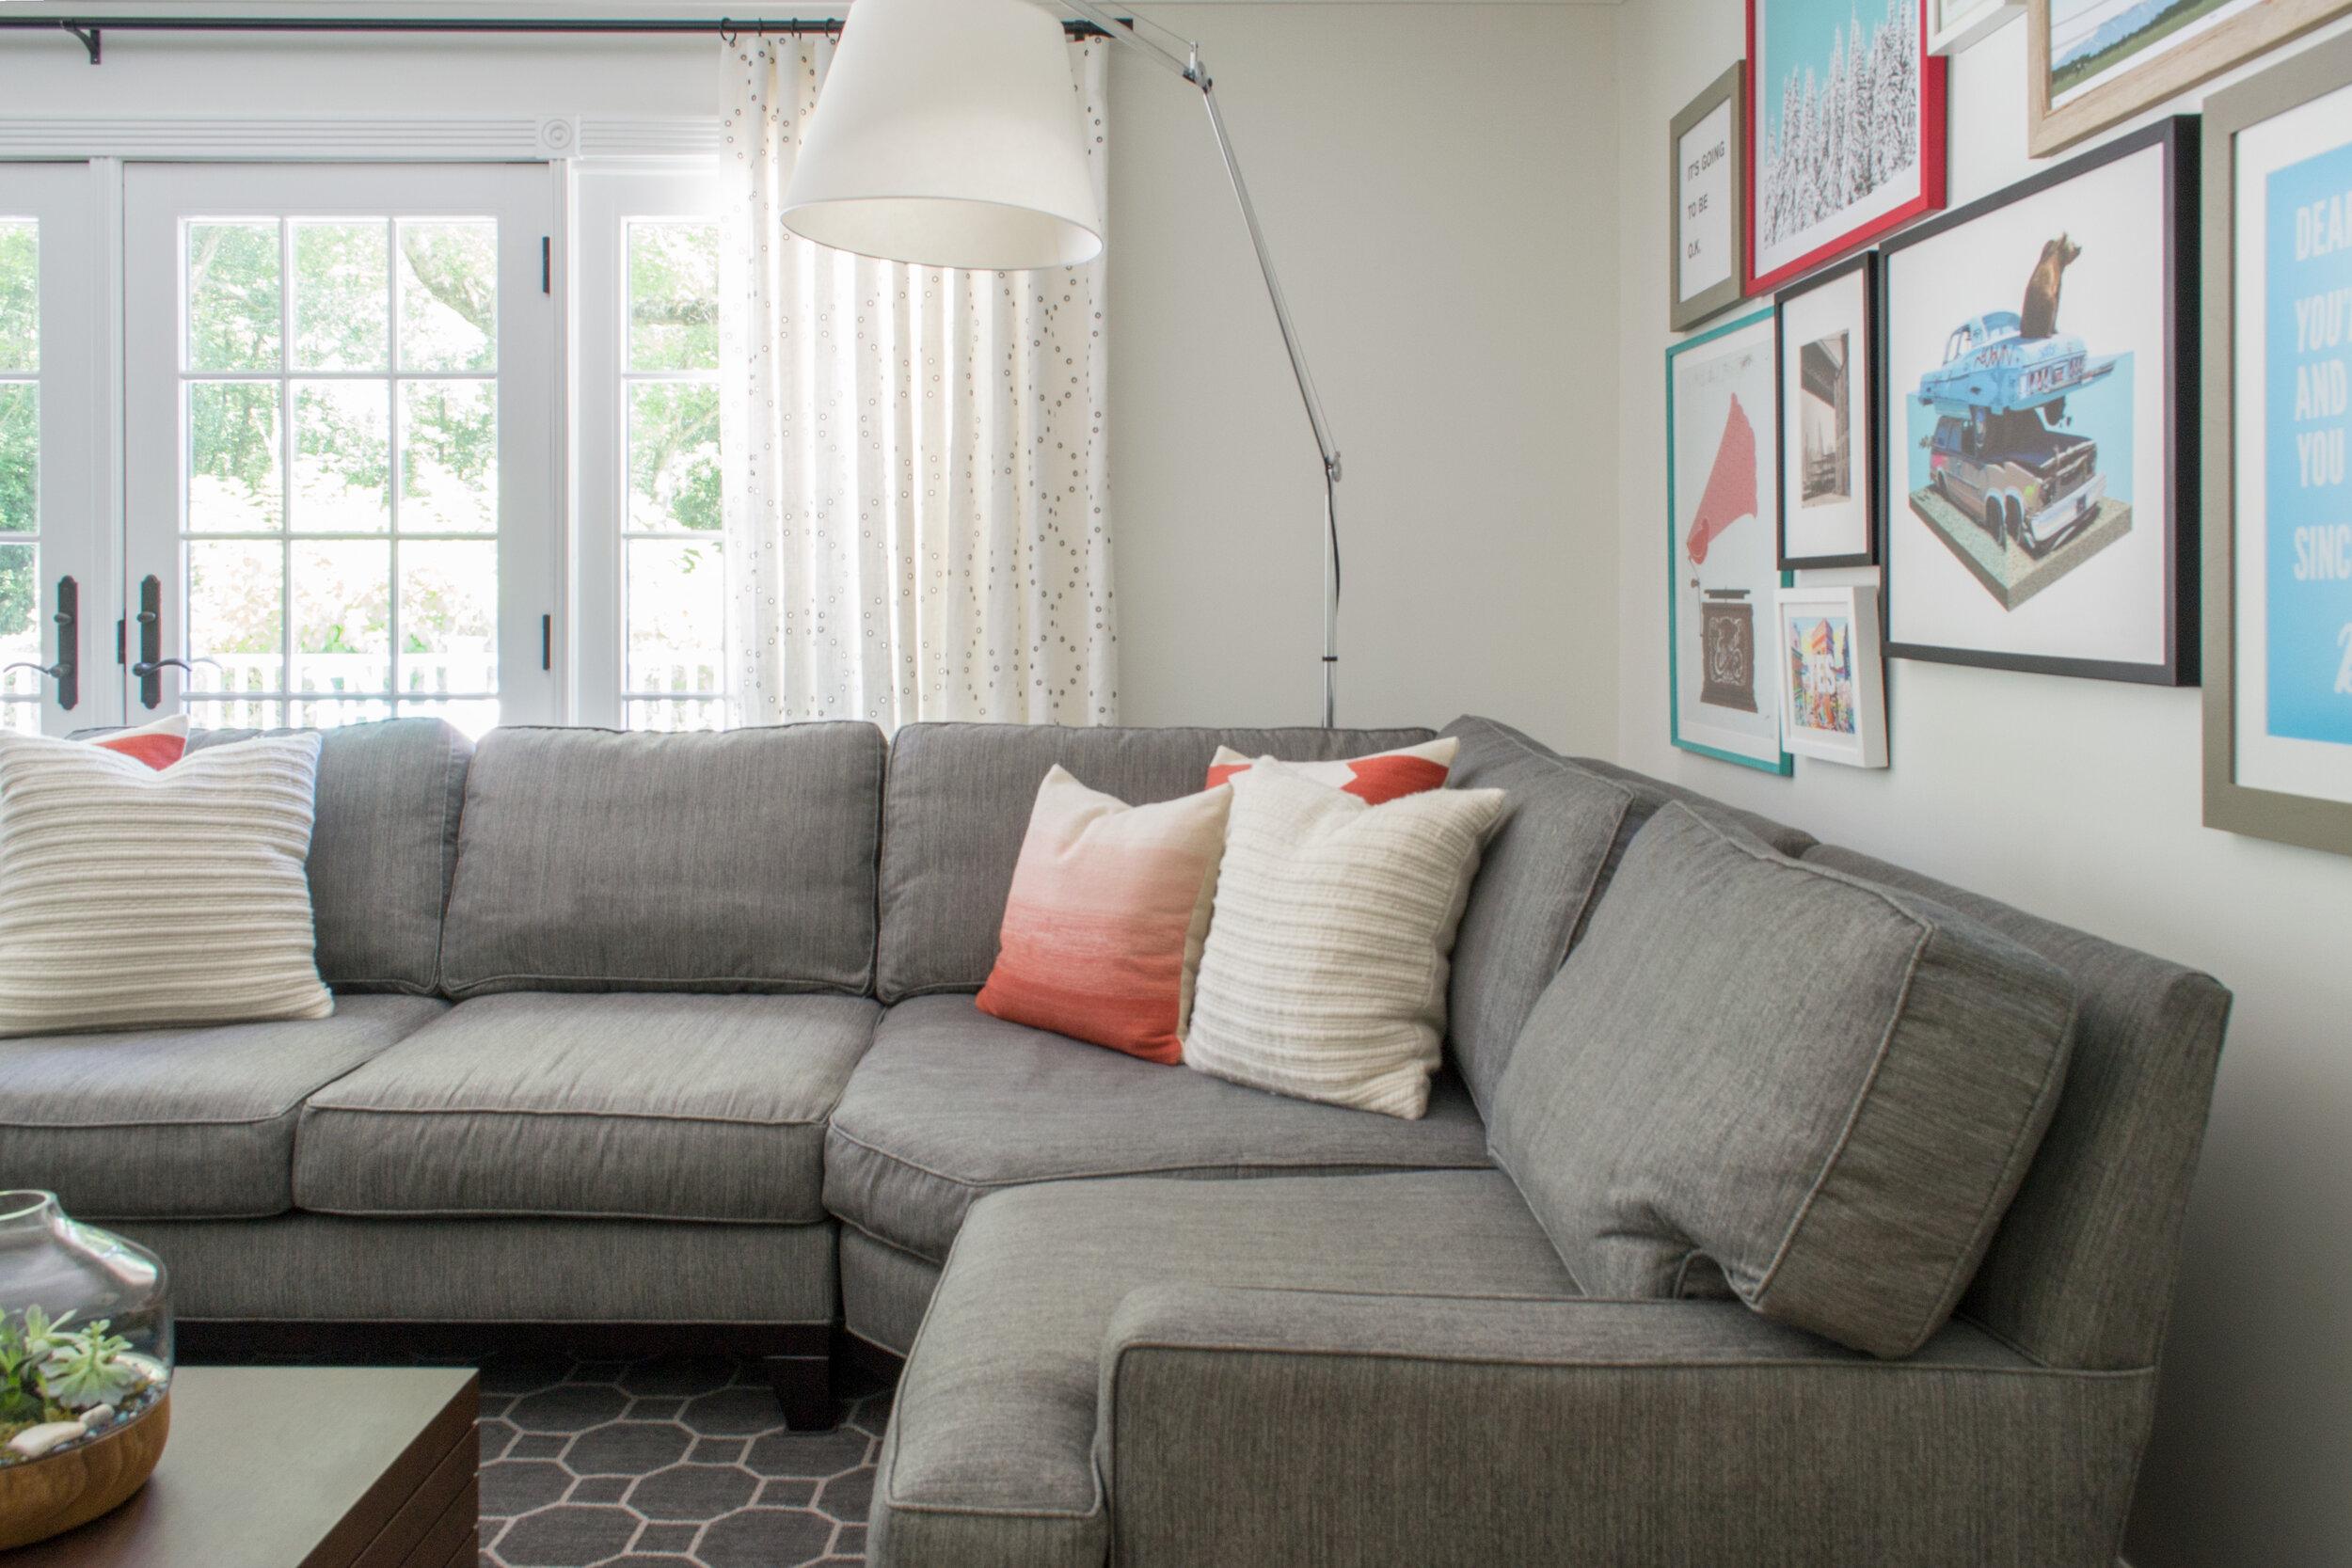 family-room-pop-of-color-tc-interiors-2.jpg